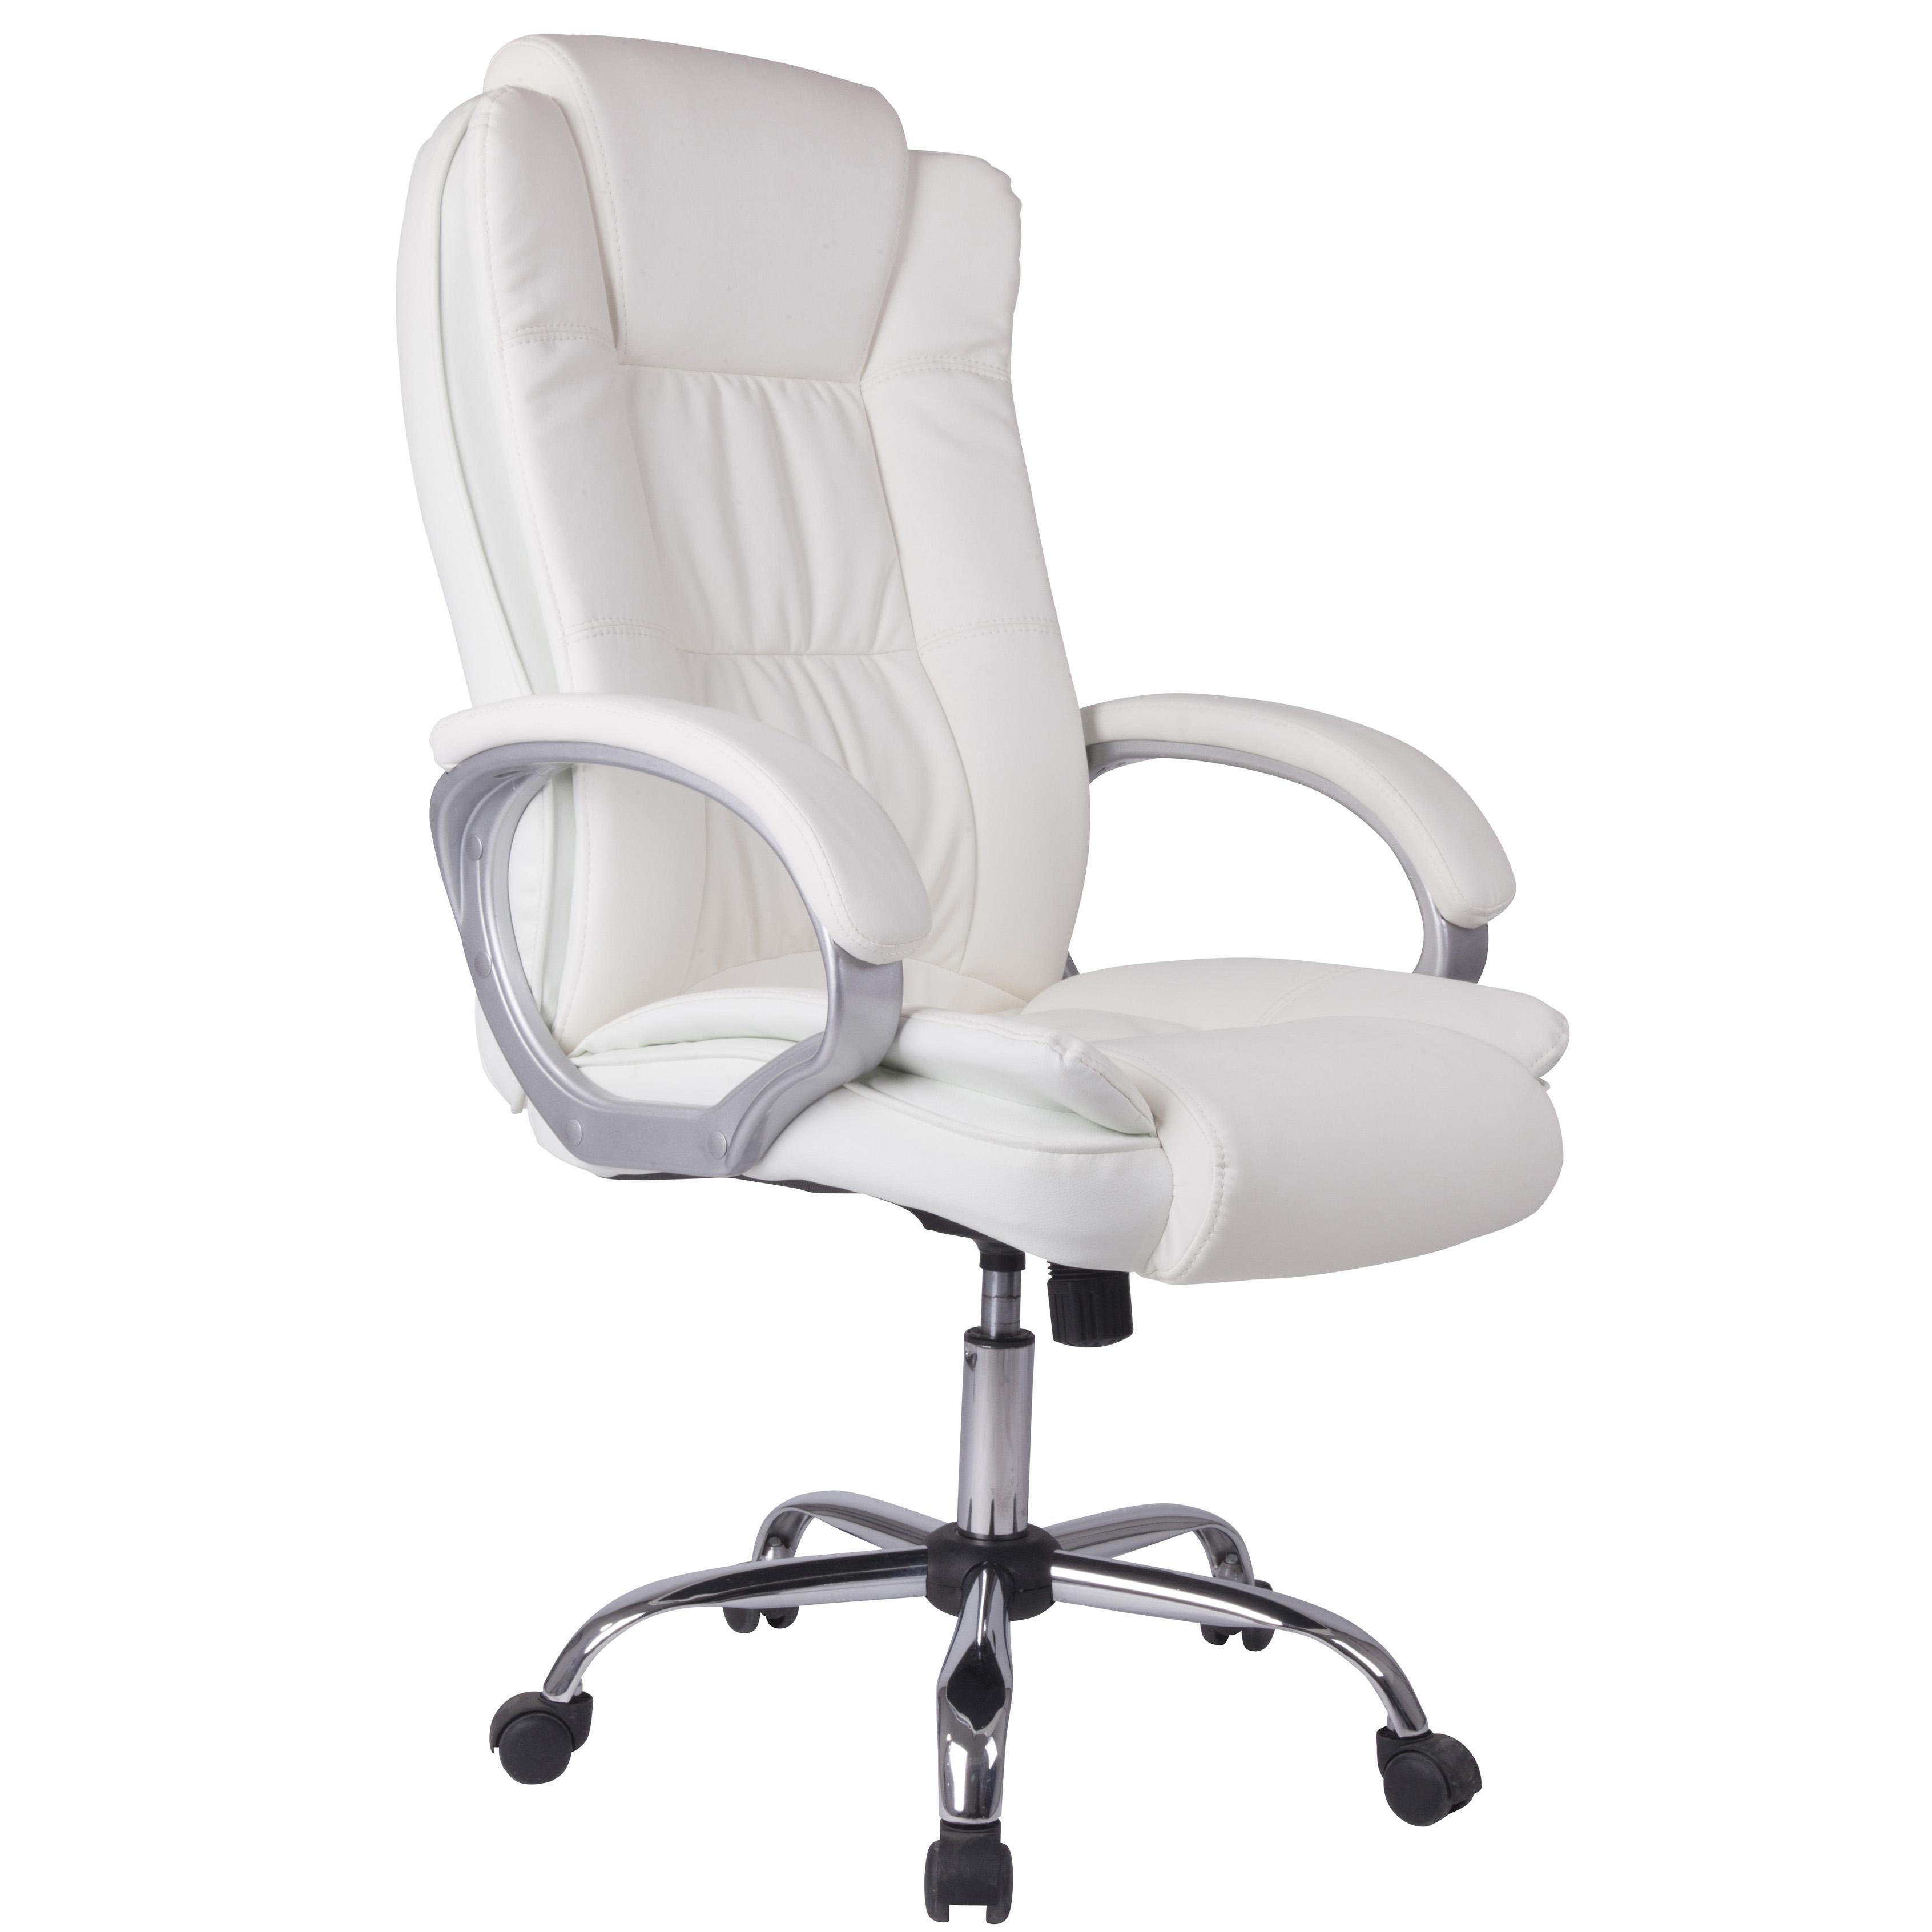 Silla de oficina blanca con cinco ruedas